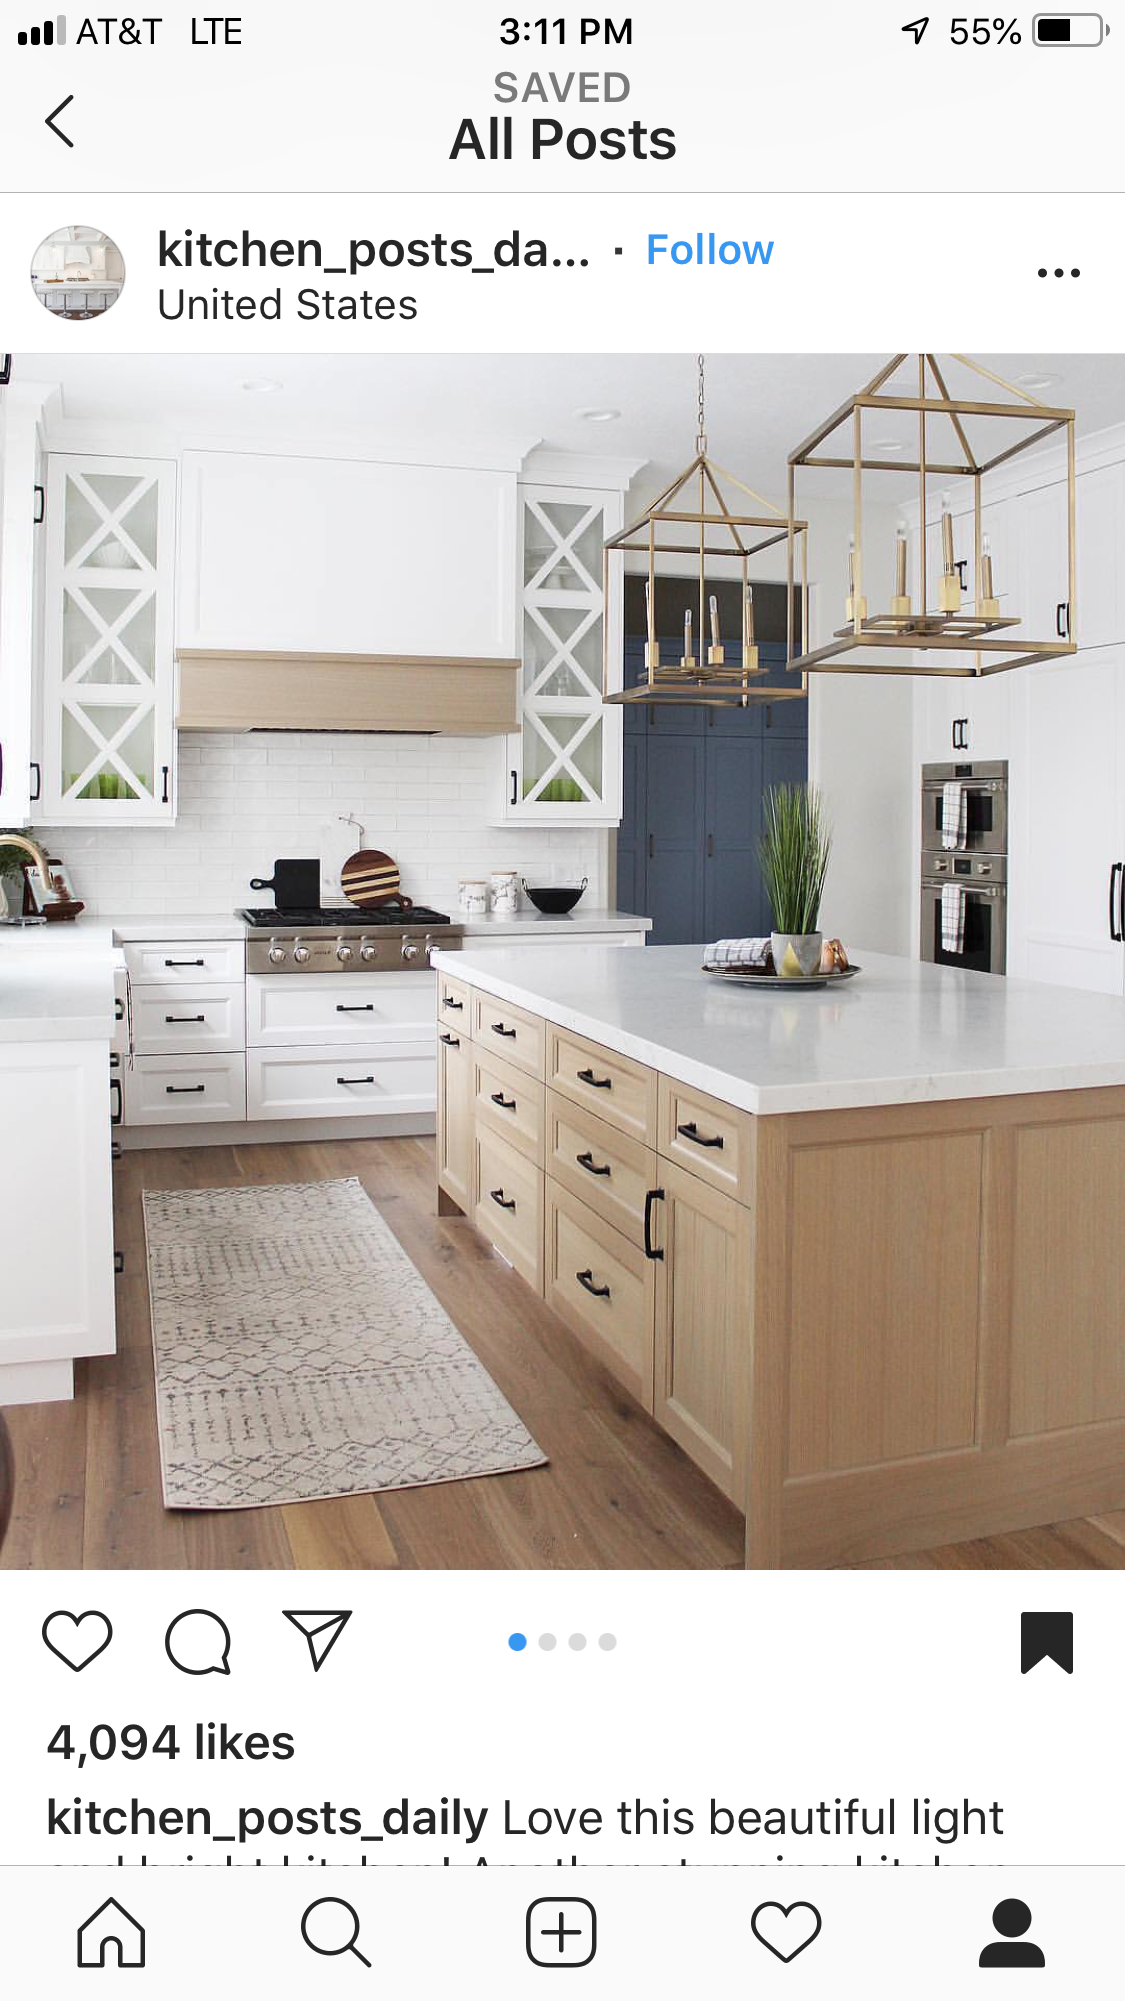 Black Hardware Gold Lights Wood Hood Kitchenlightinglayoutideas Outdoor Kitchen Design Outdoor Kitchen Design Layout Kitchen Designs Layout